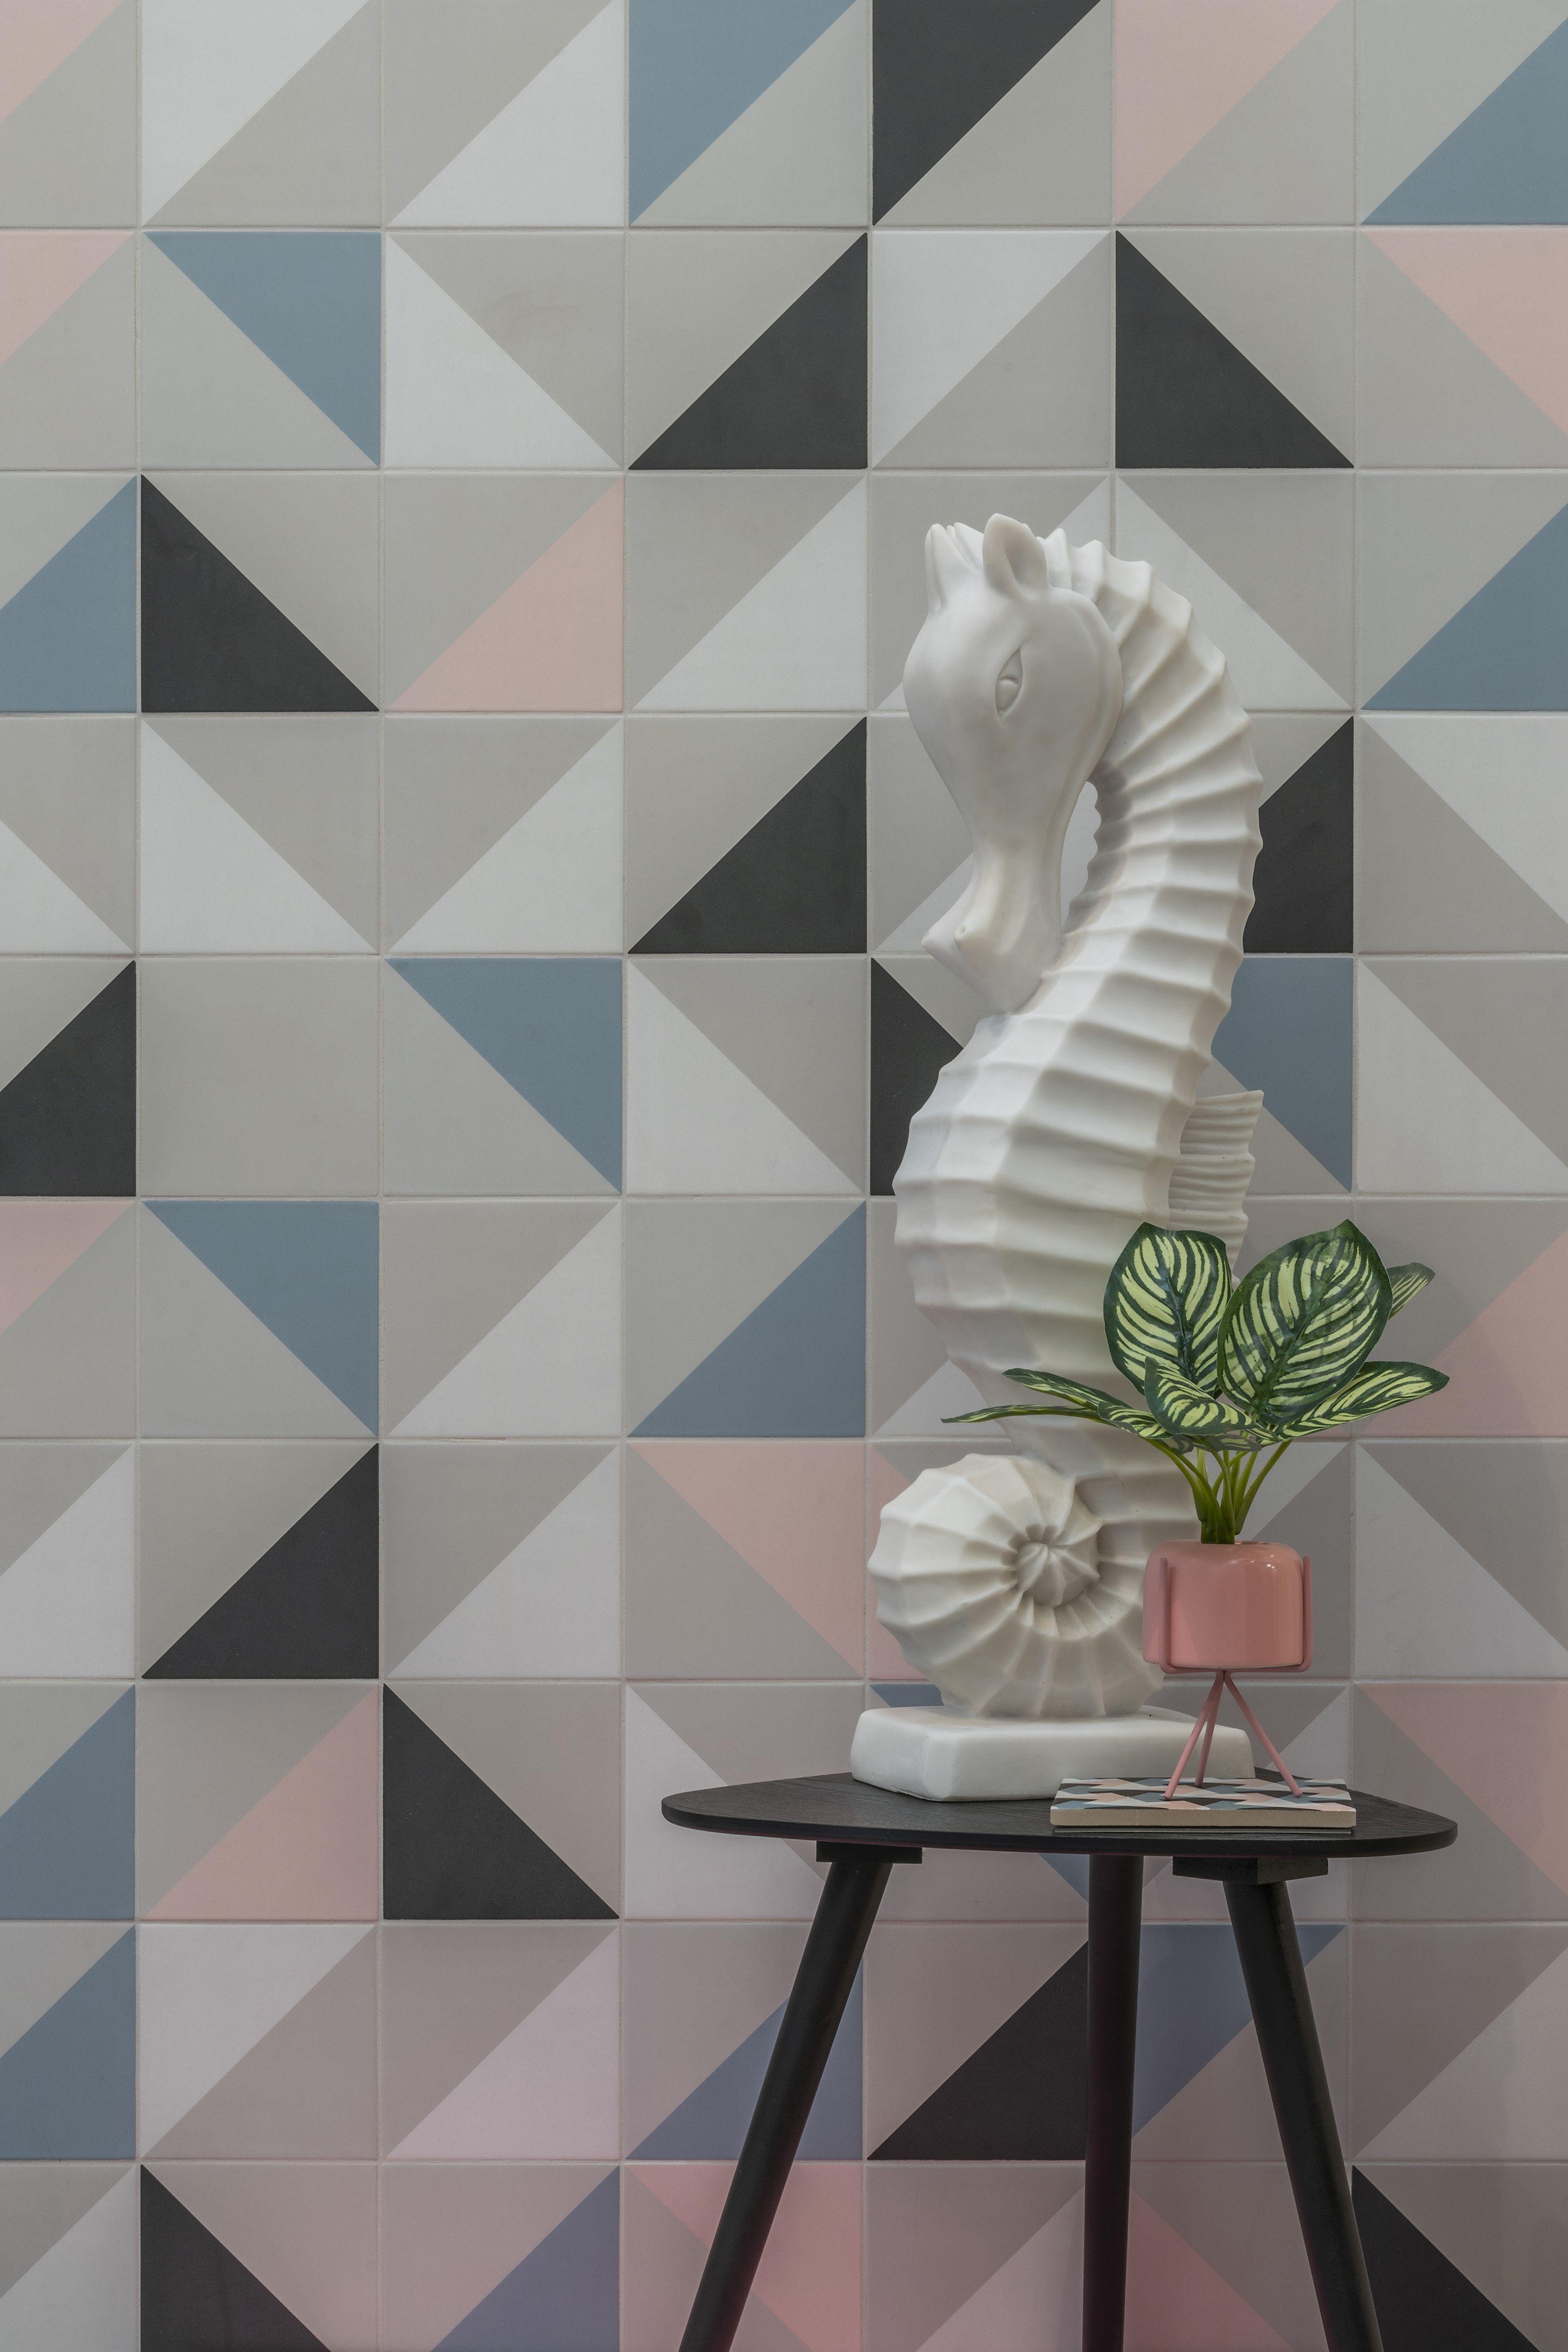 Futura Tiles By 41zero42 At Tilestyle Pink Tiles Colorful Wallpaper Tiles